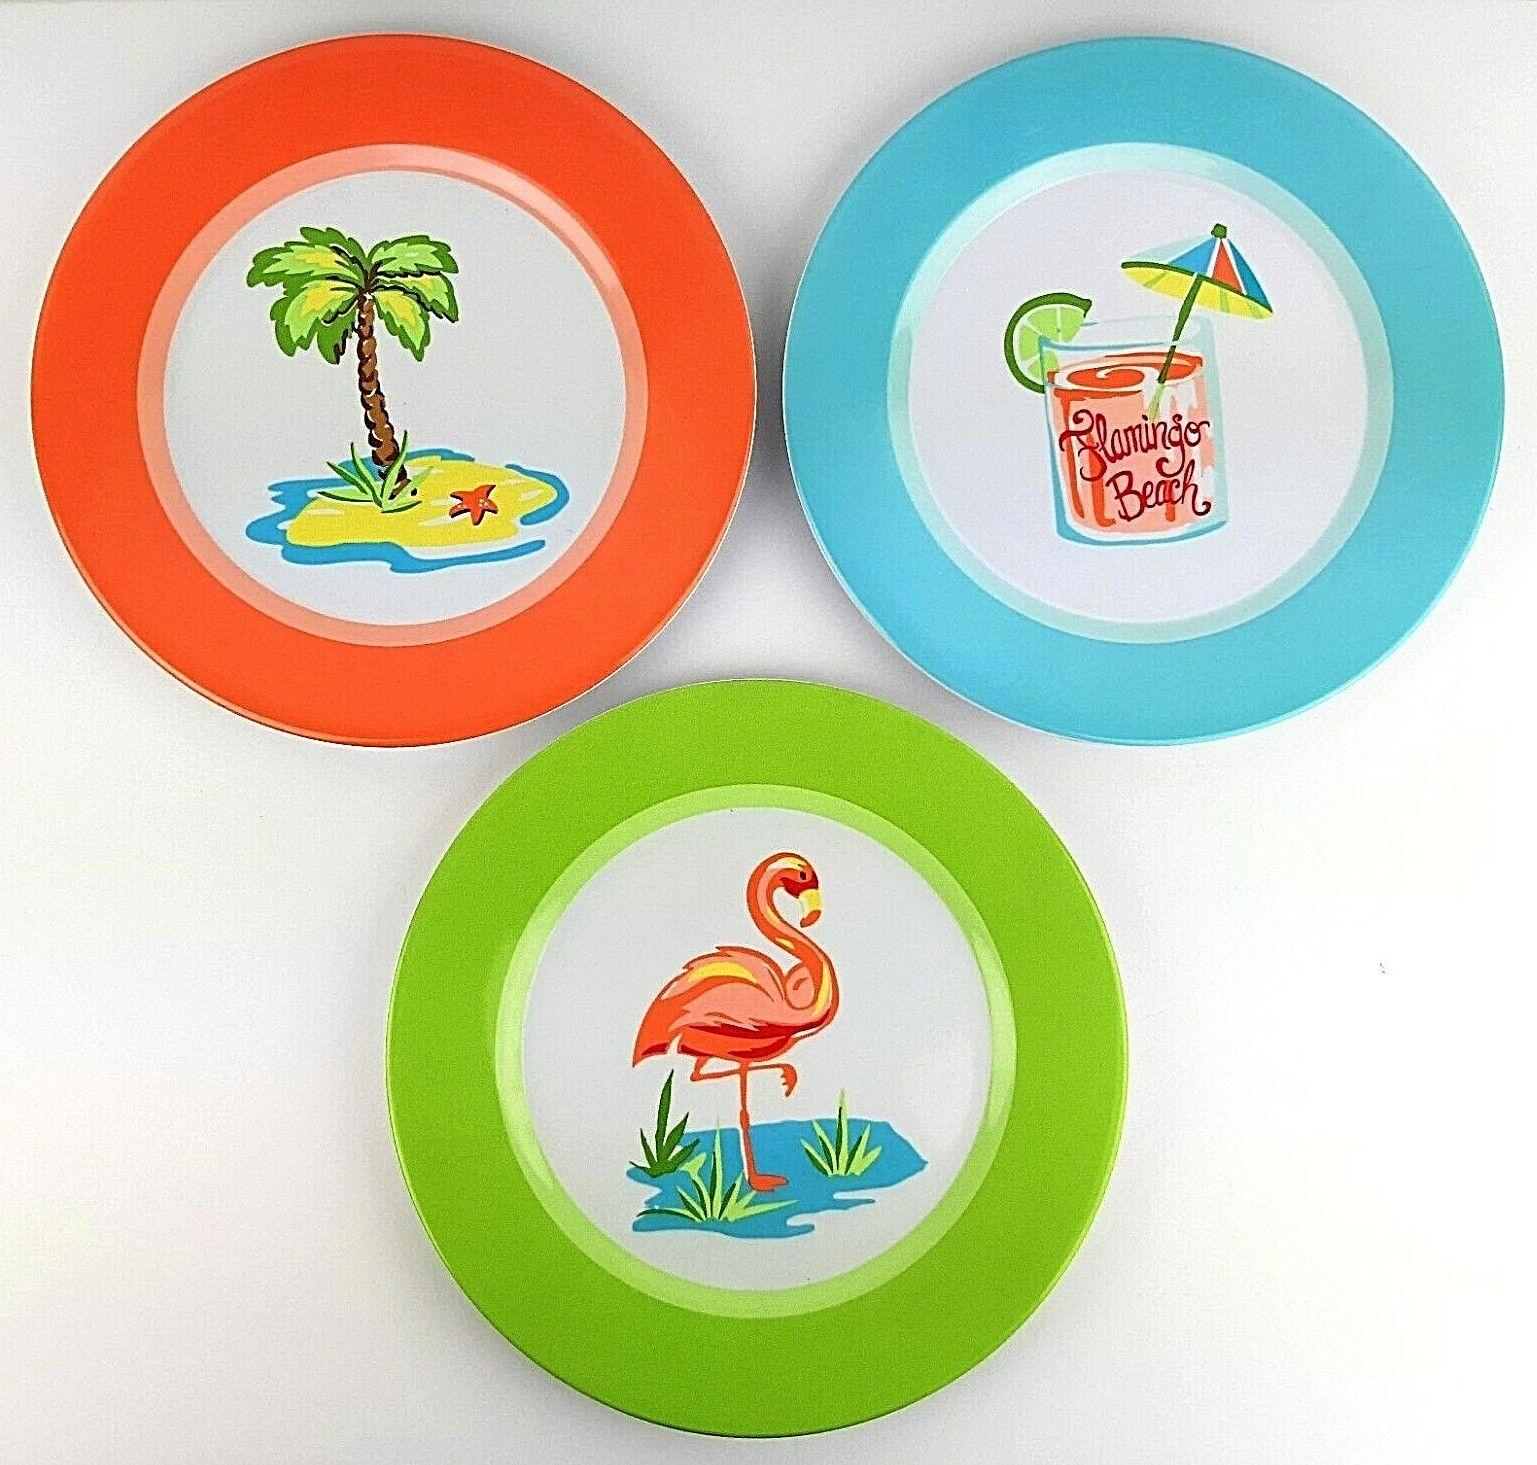 Coastal Living Seascapes Navy and White Flamingo Toucan Tropical Palm Flowers Melamine Salad Plates Set of 4